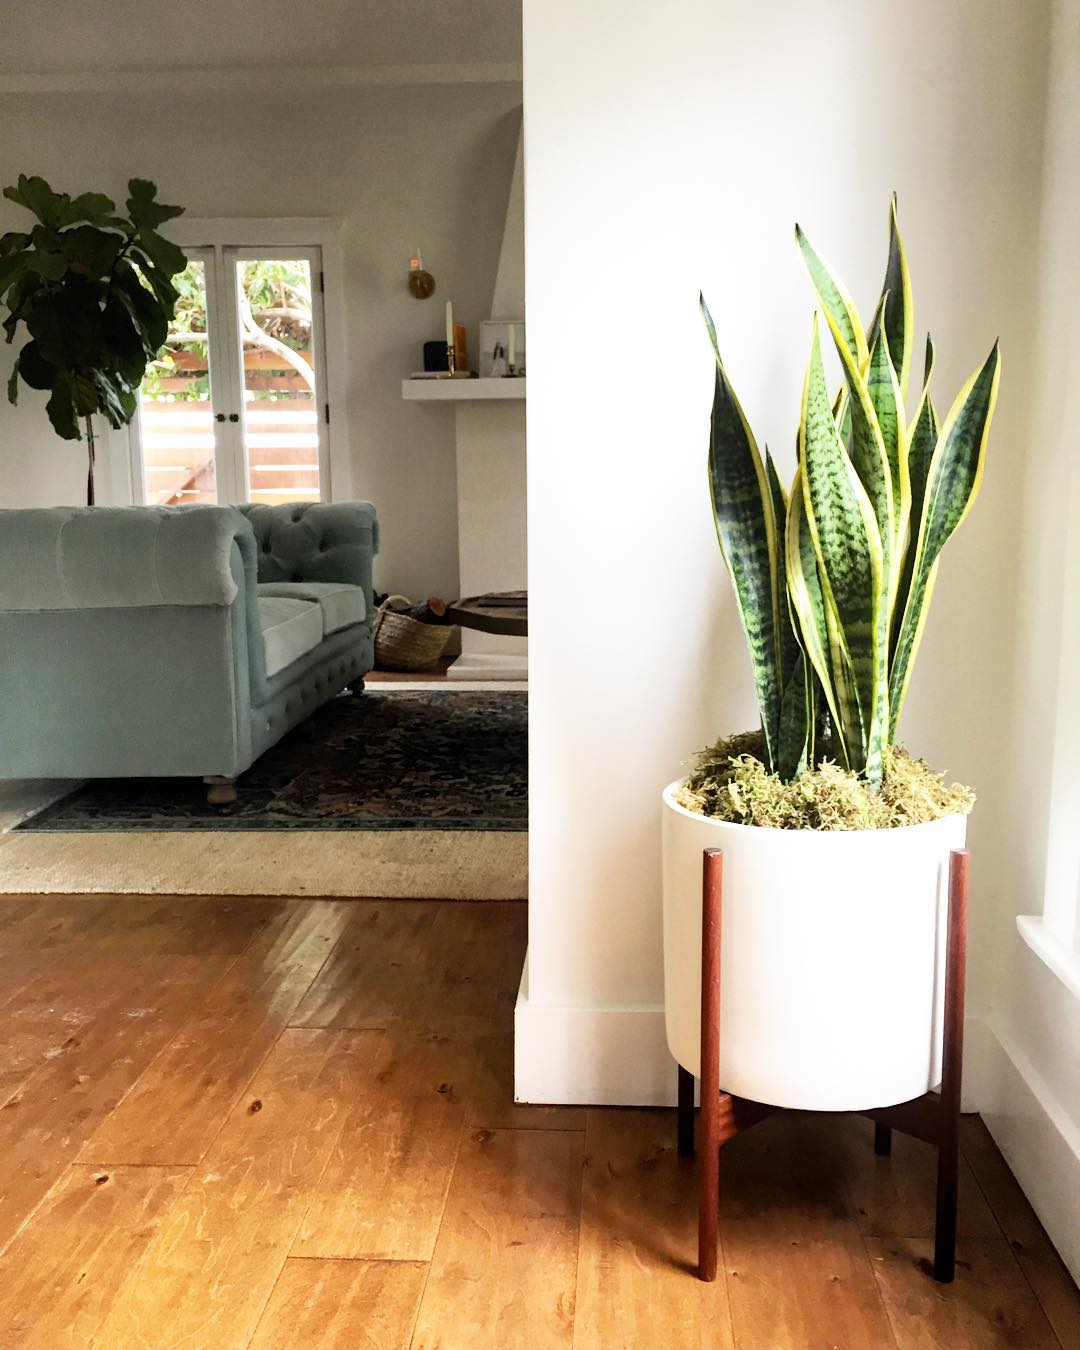 best indoor plants for office. 1. Snake Plant Best Indoor Plants For Office